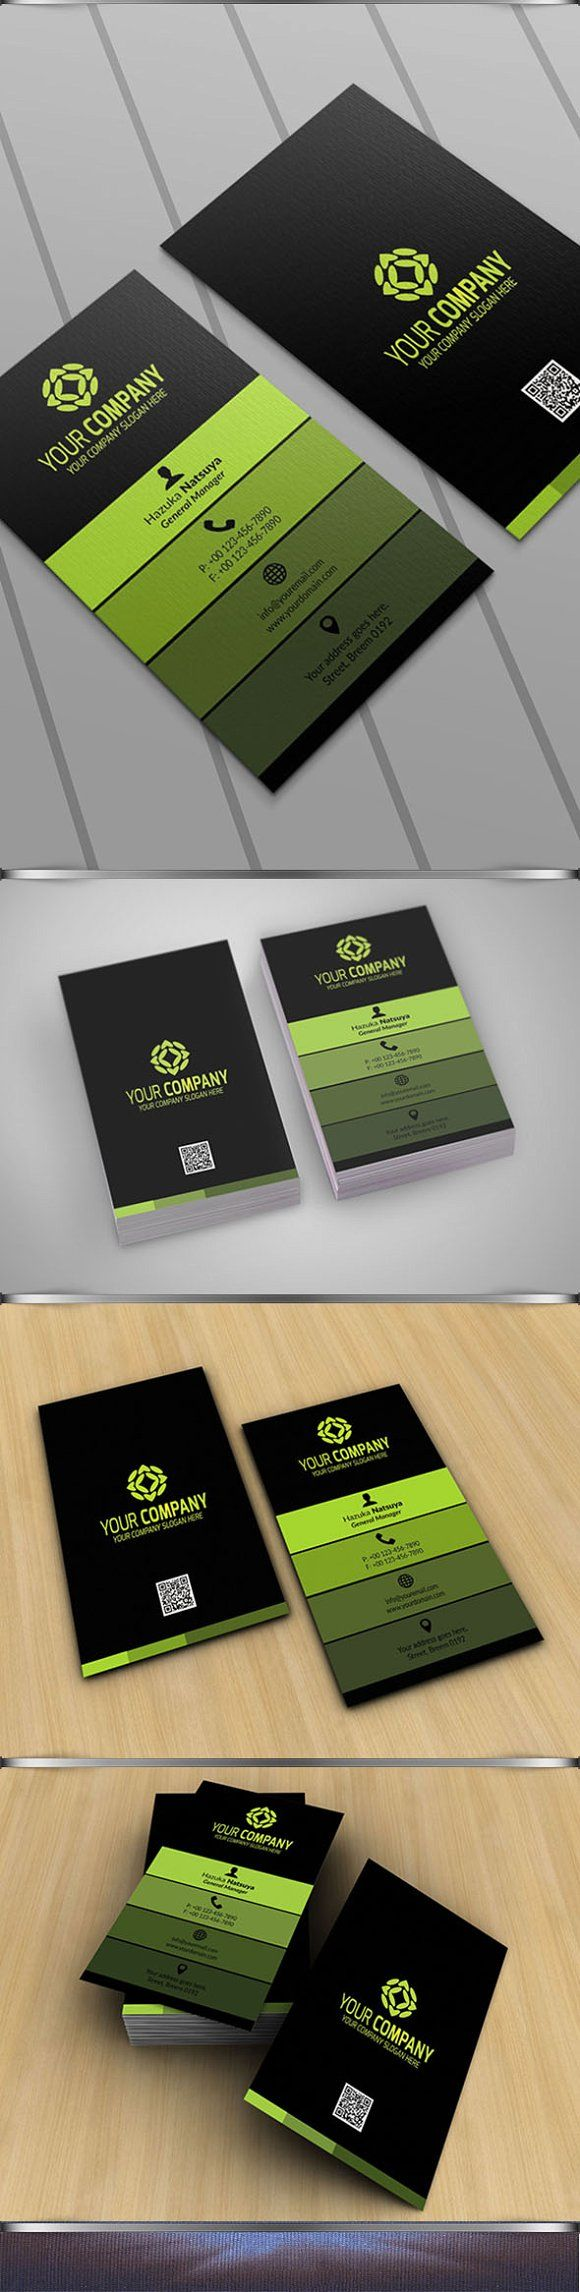 Best 25 business card size ideas on pinterest standard business modern corporate business card vol 3 by sukidesu on creativemarket magicingreecefo Choice Image